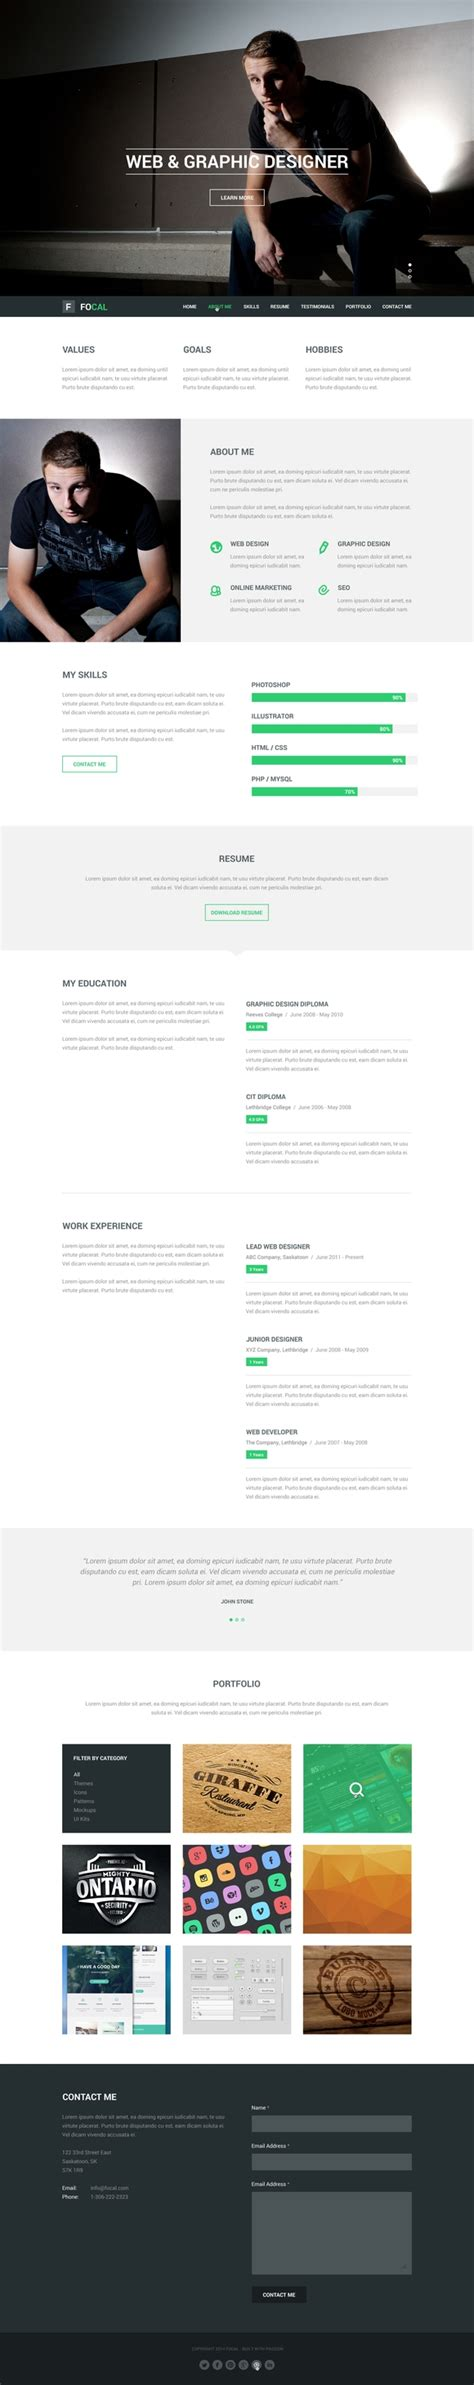 Free Psd Web Templates 2016